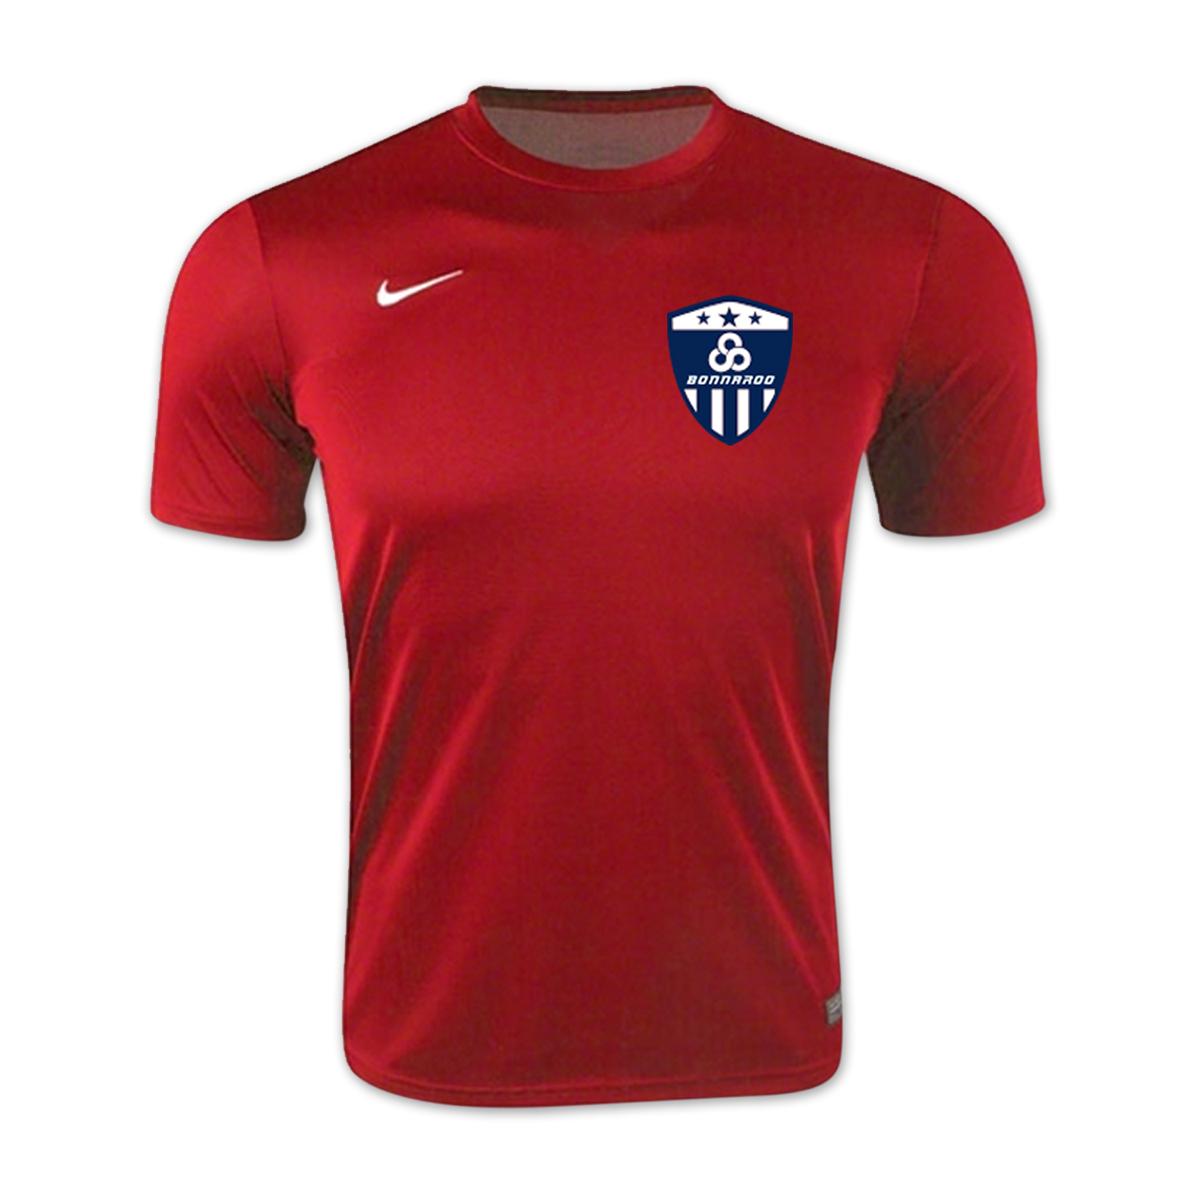 Bonnaroo 2016 Soccer Jersey